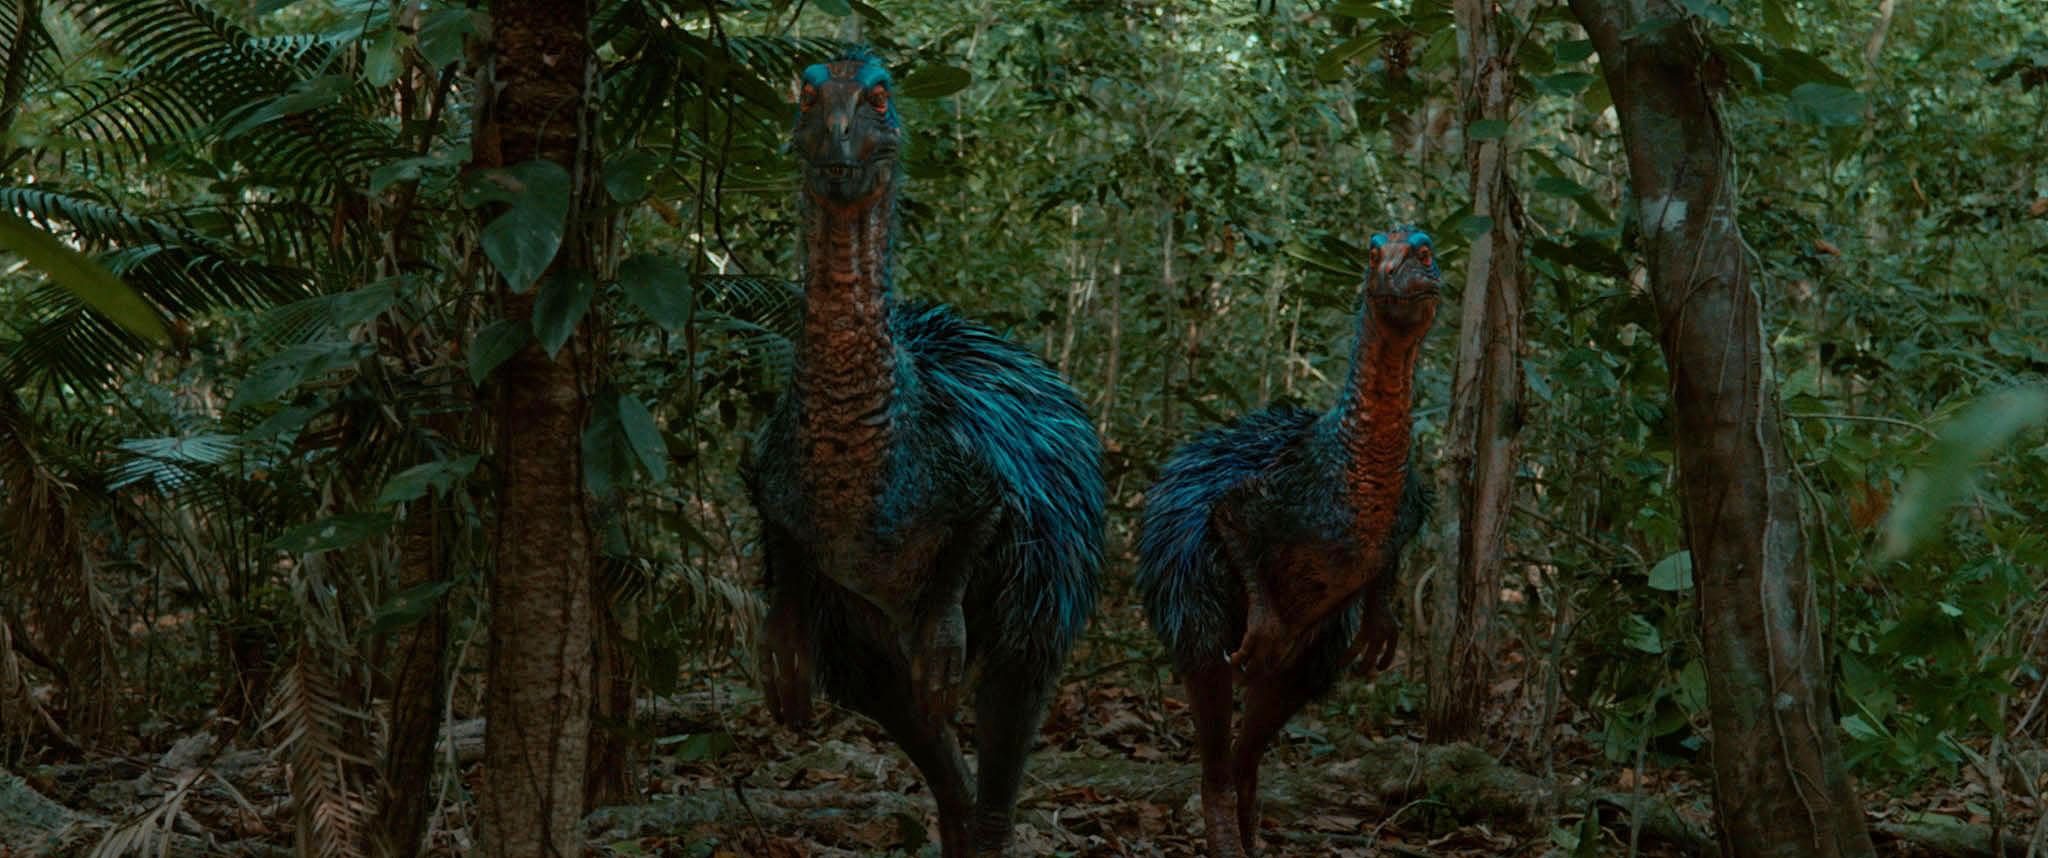 dromaeosaurus_2014_01.jpg